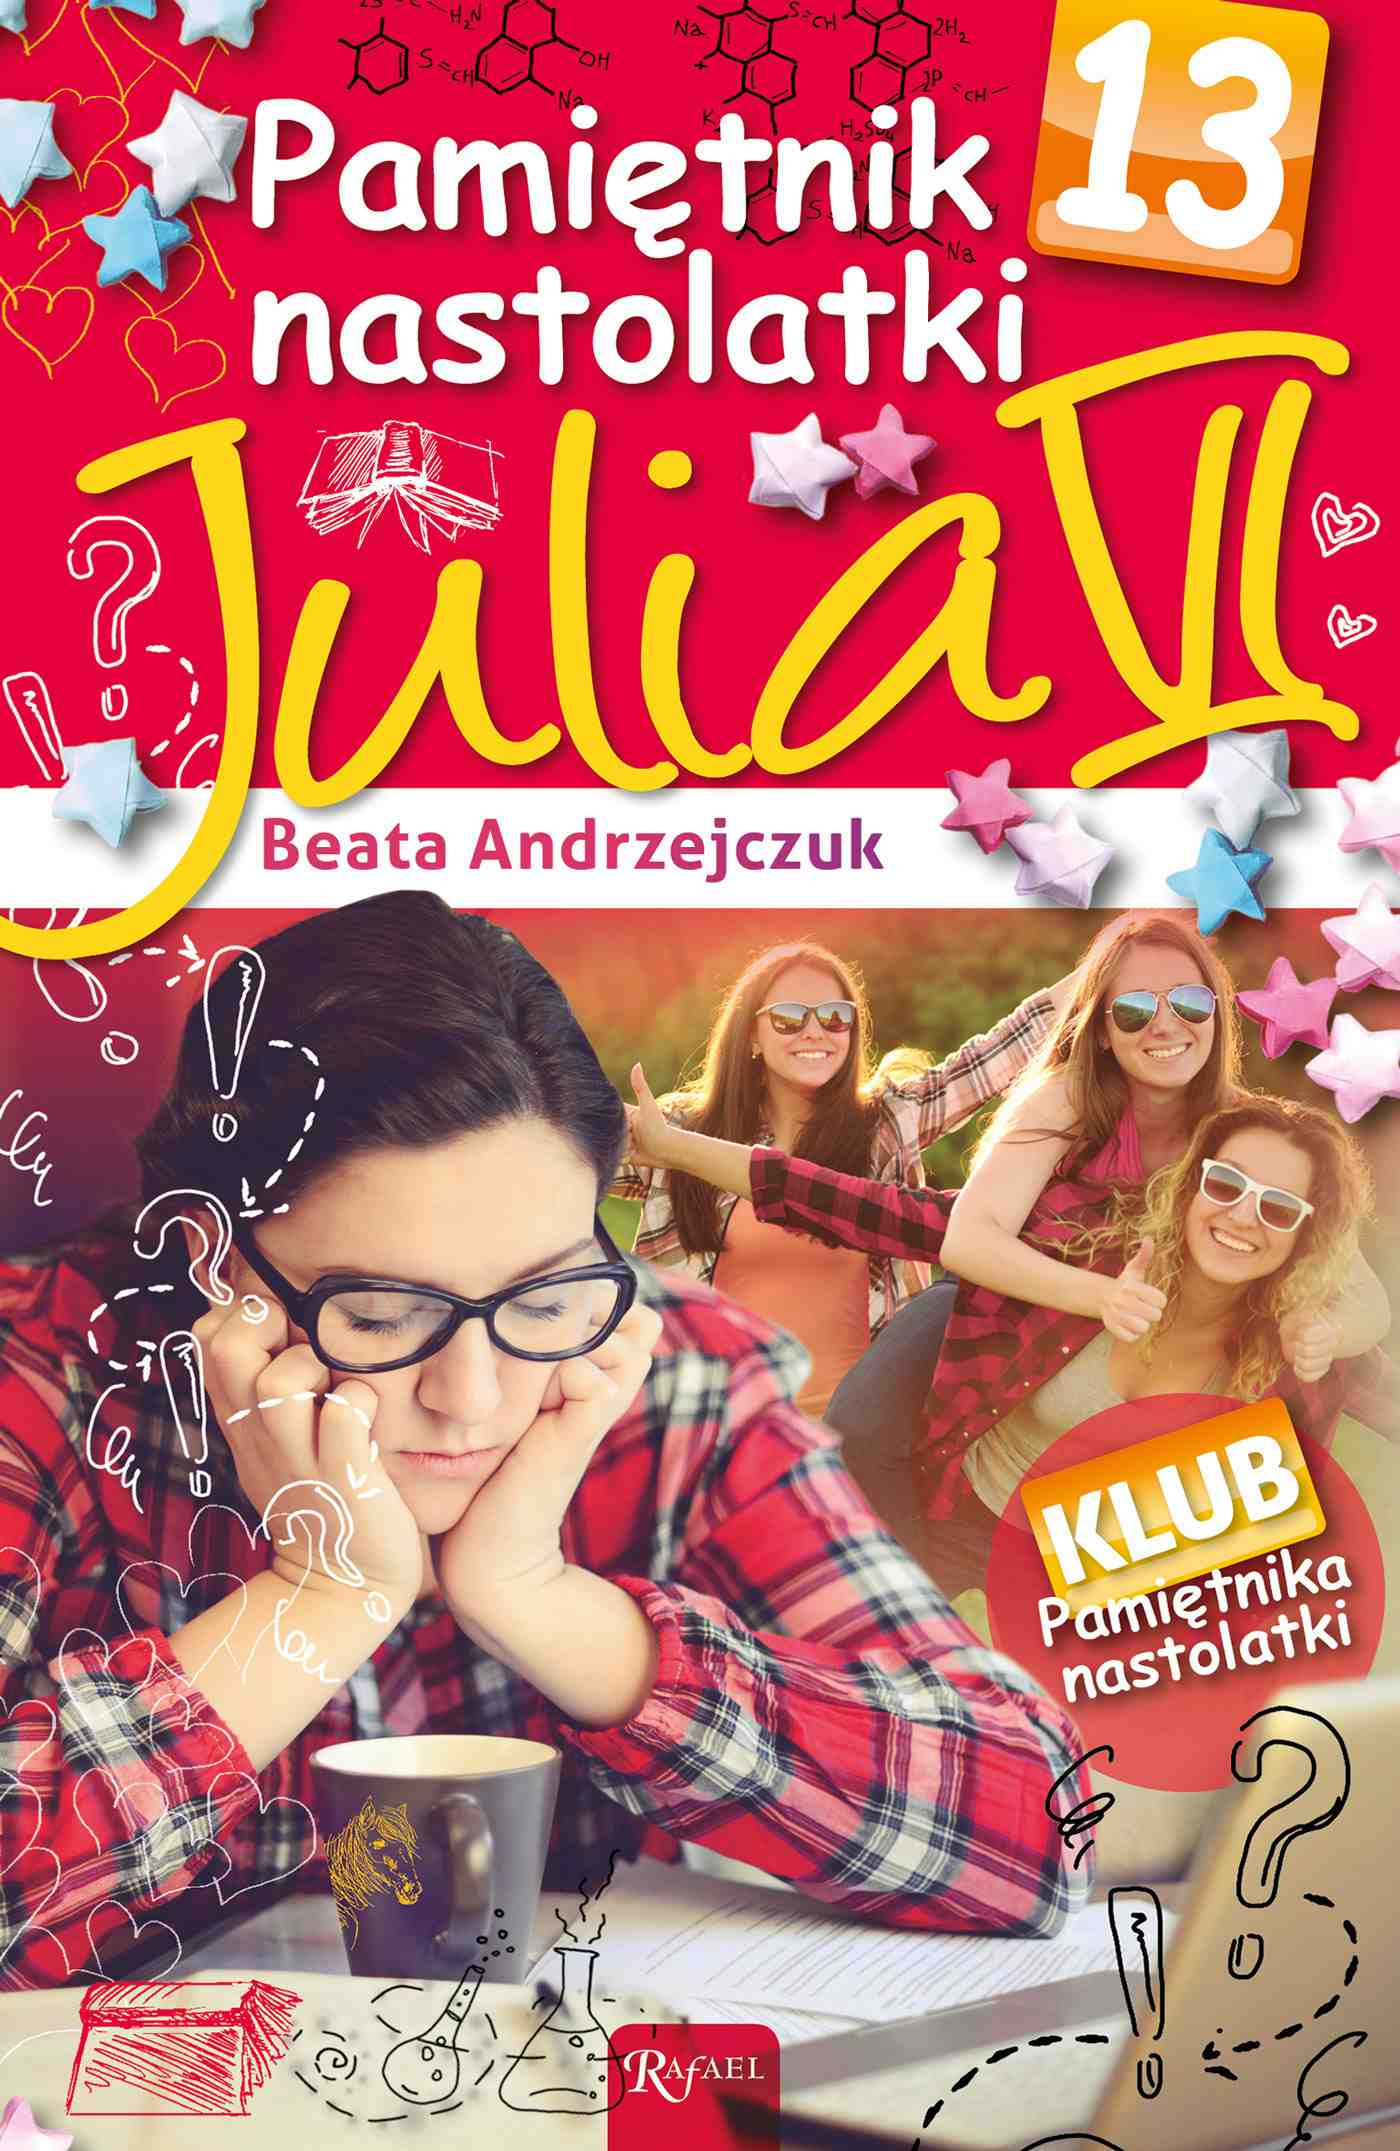 Pamiętnik nastolatki 13. Julia VI - Ebook (Książka PDF) do pobrania w formacie PDF